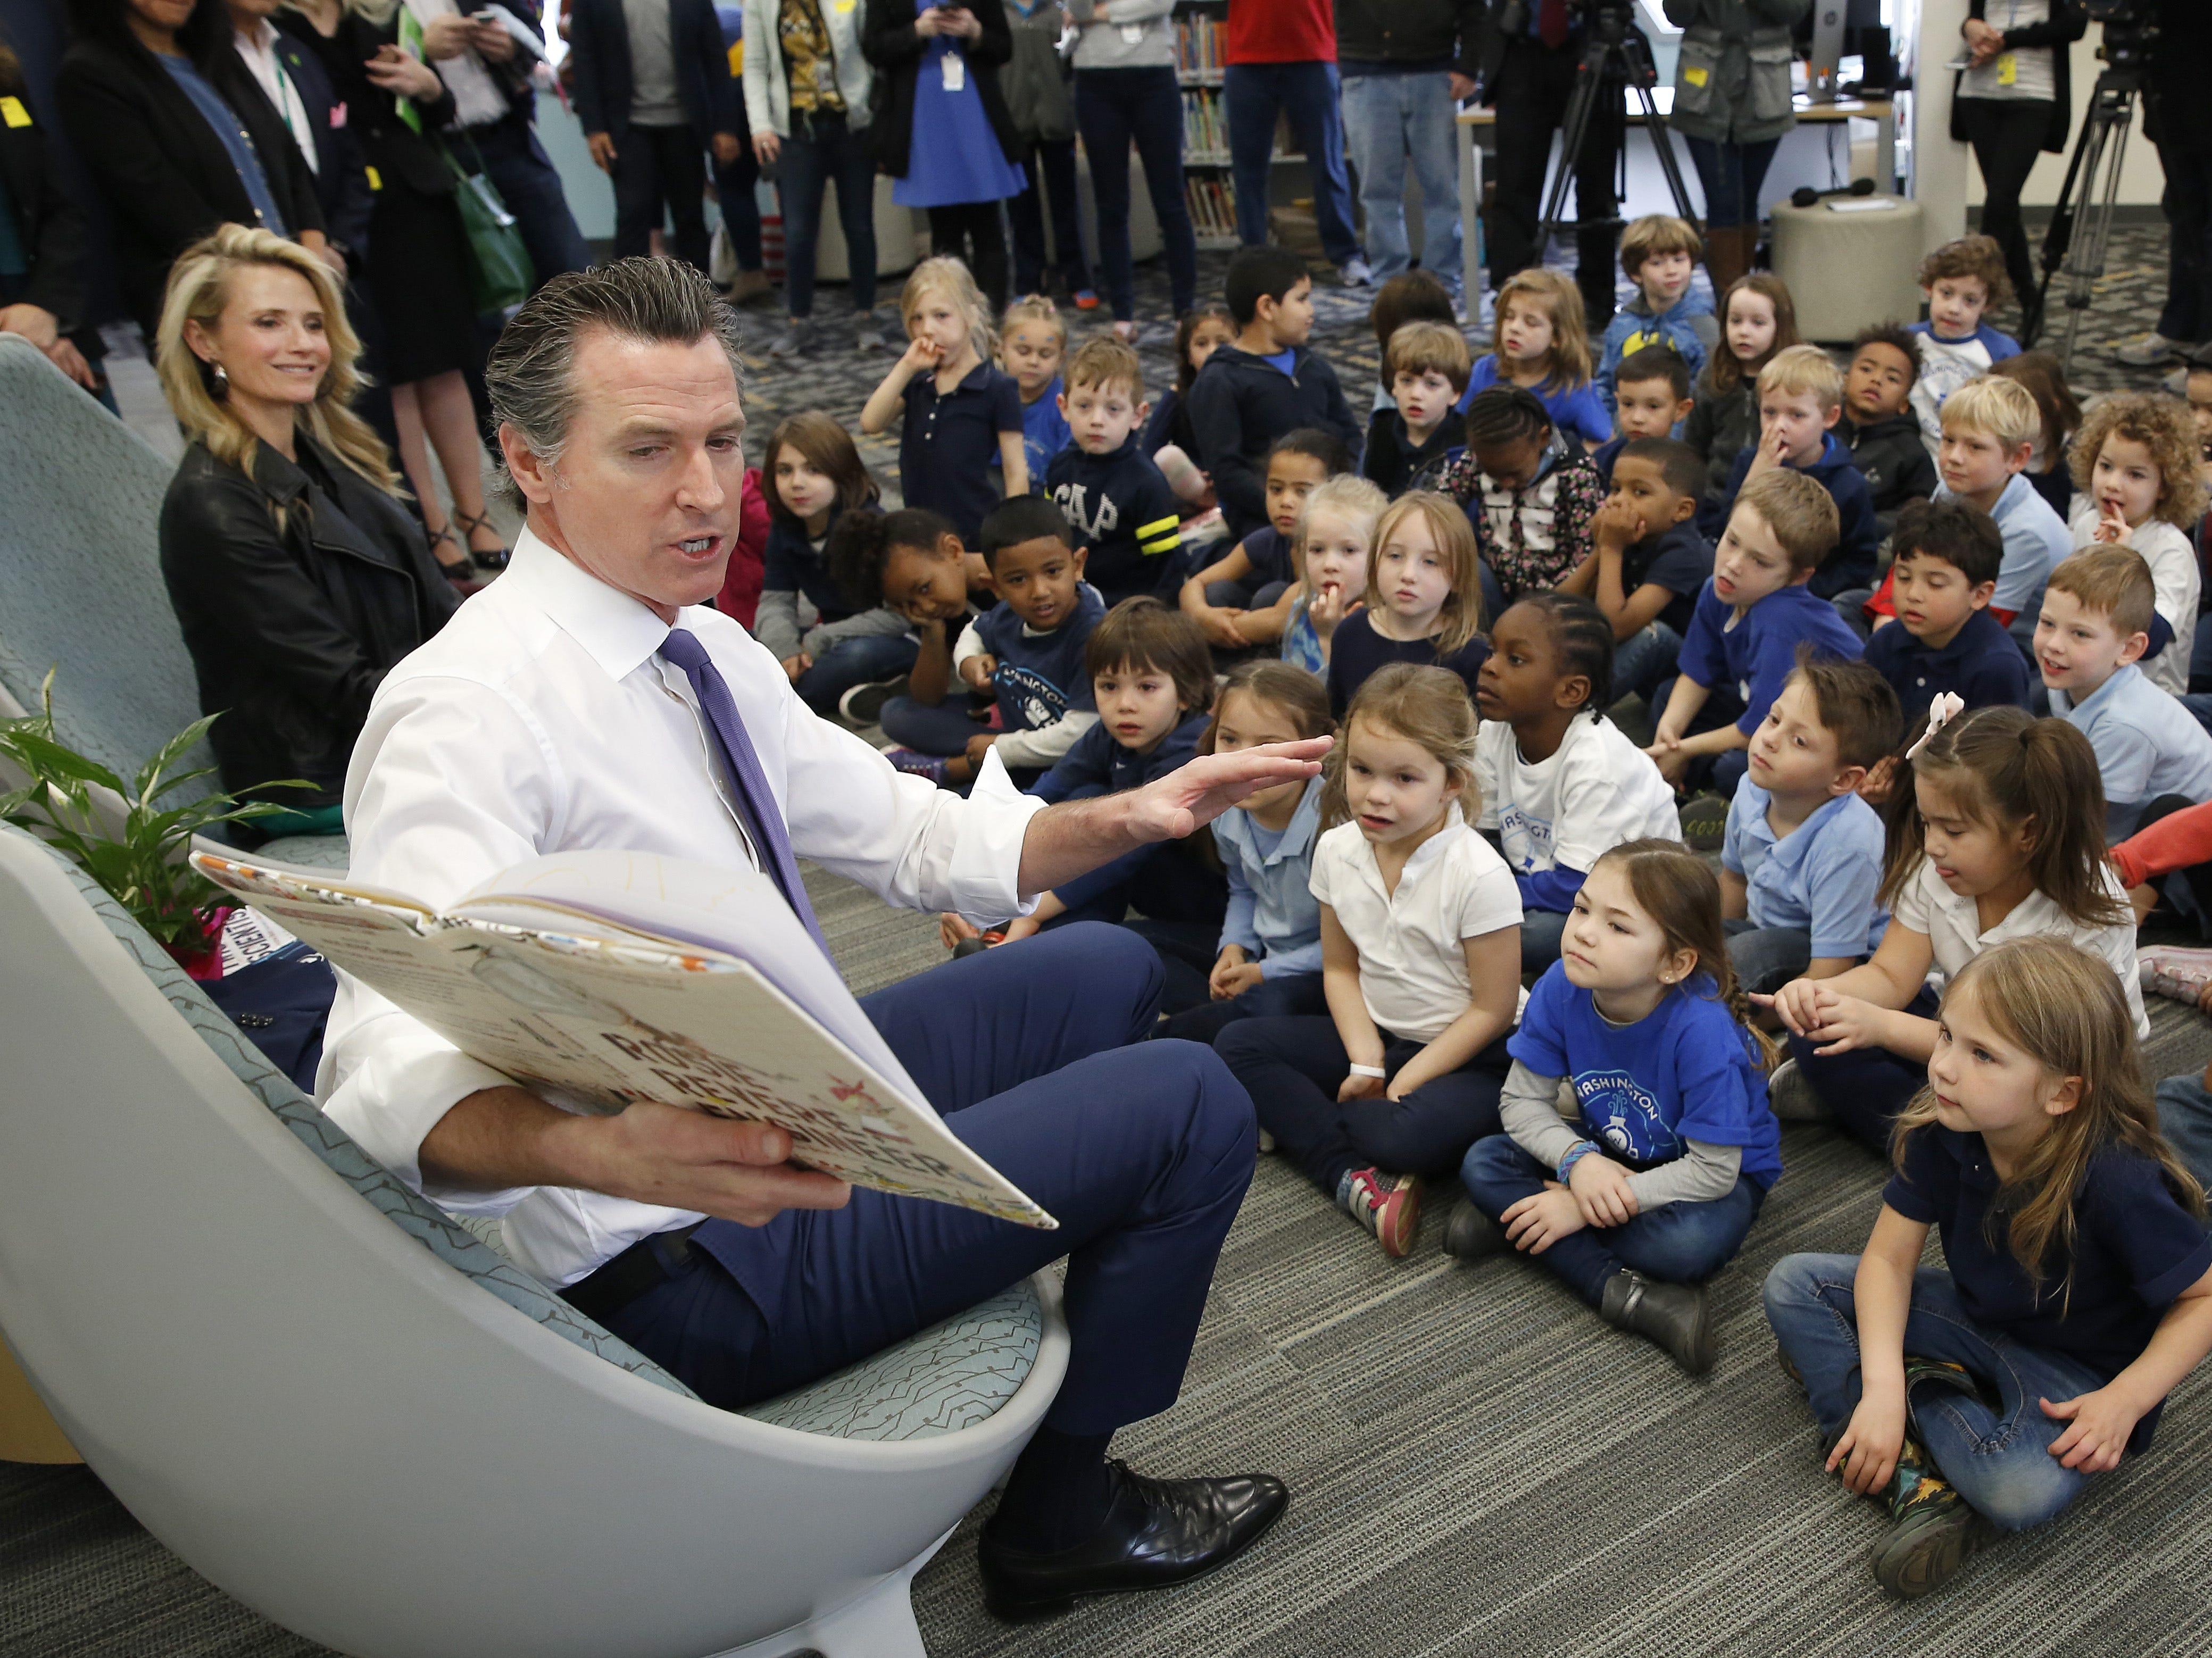 Gov. Gavin Newsom reads to kindergarteners at the Washington Elementary School in Sacramento on Friday, March 1, 2019. Newsom, accompanied by his wife, Jennifer Siebel Newsom, left, visited the school to celebrate Read Across America Day.